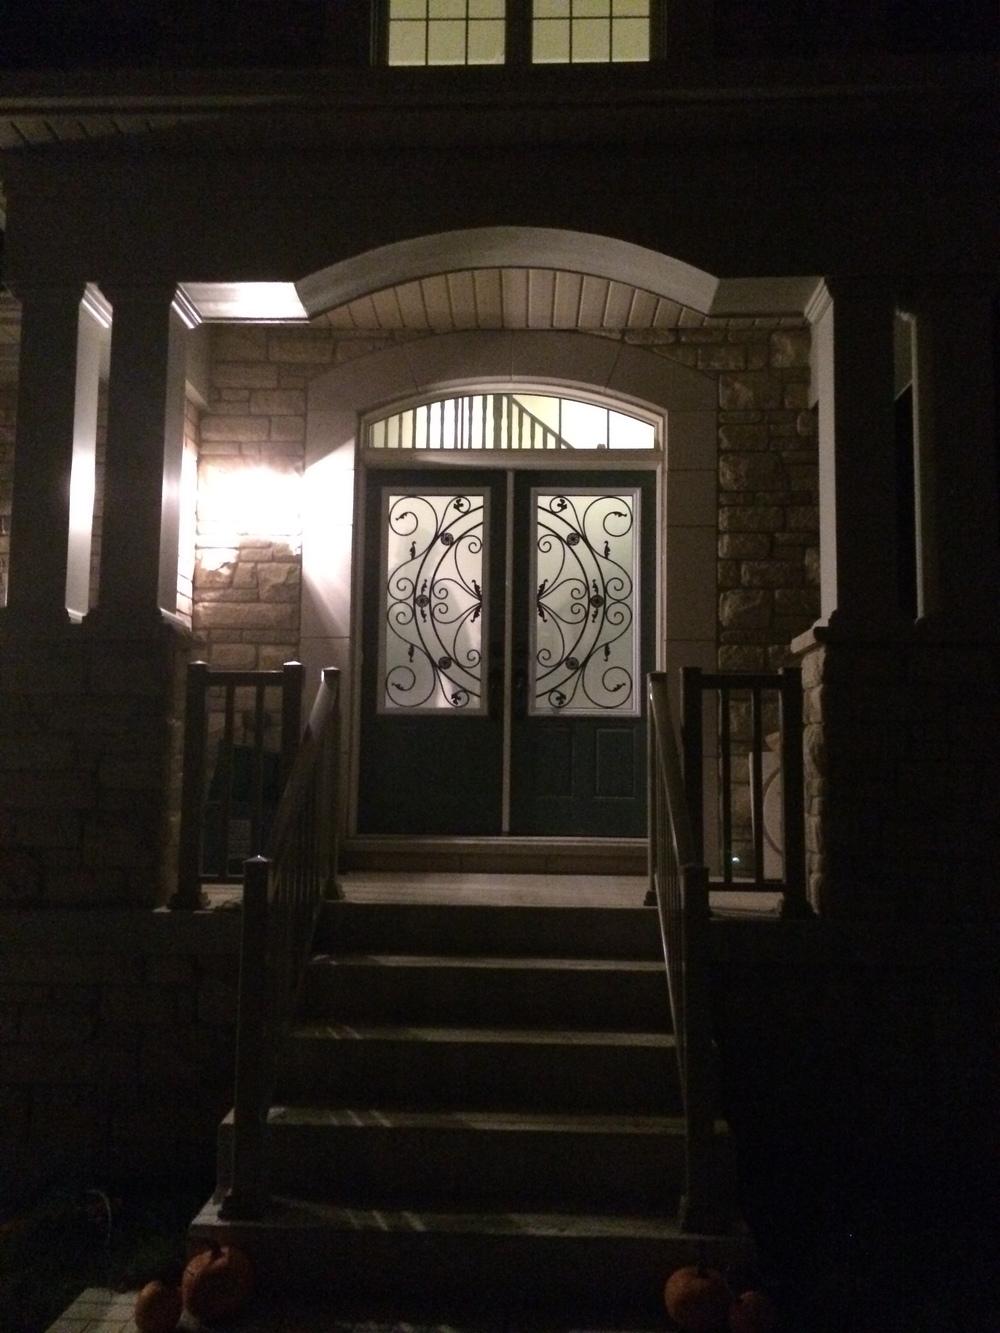 Campbellsford-Wrought-Iron-Glass-Door-Inserts-Pickering-Ontario